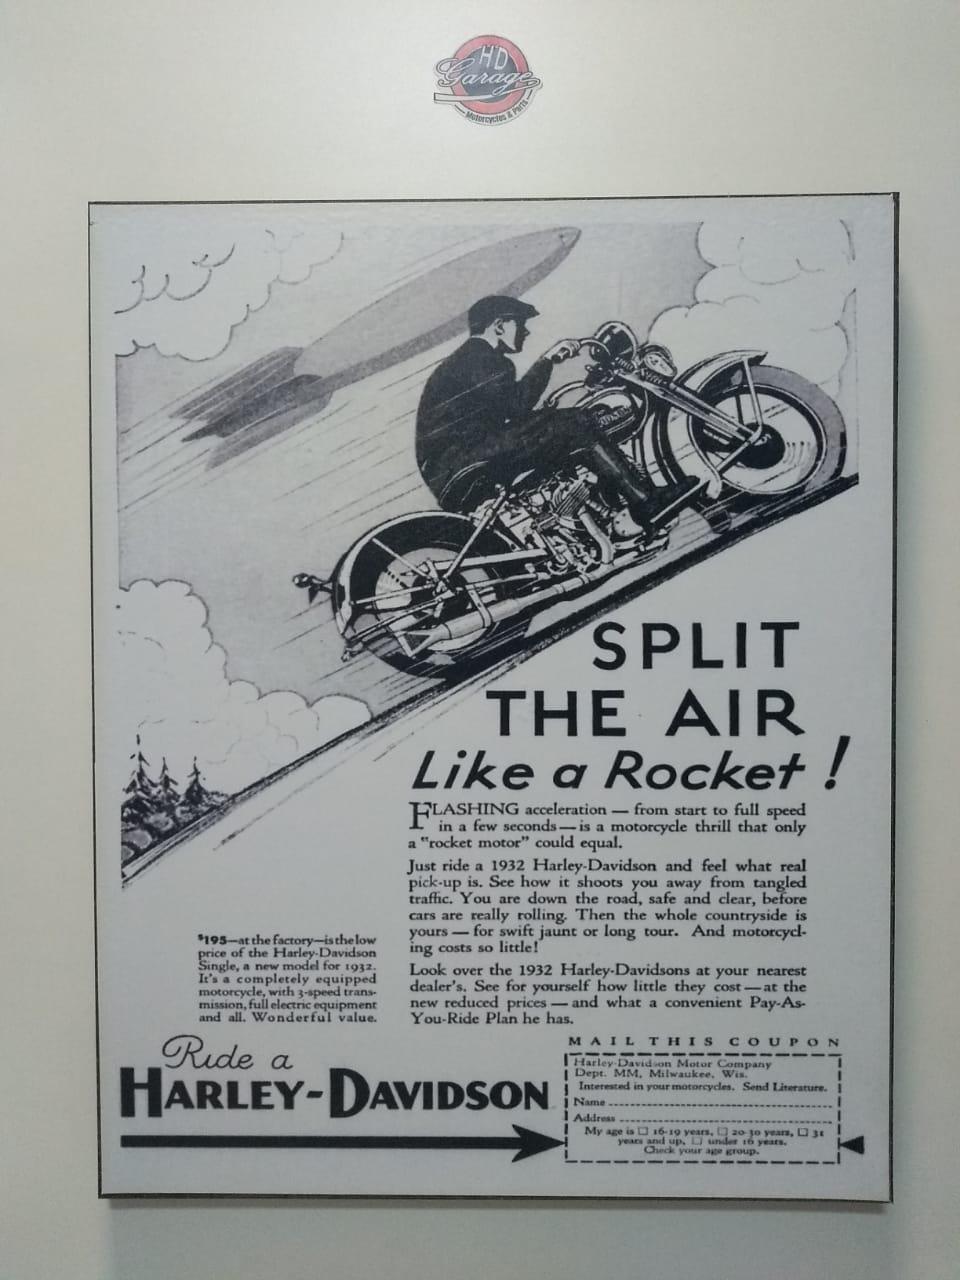 Chapa Decorativa - Motivo Harley-Davidson - MDF 40 X50 CM - Modelo 12 - 034/24201